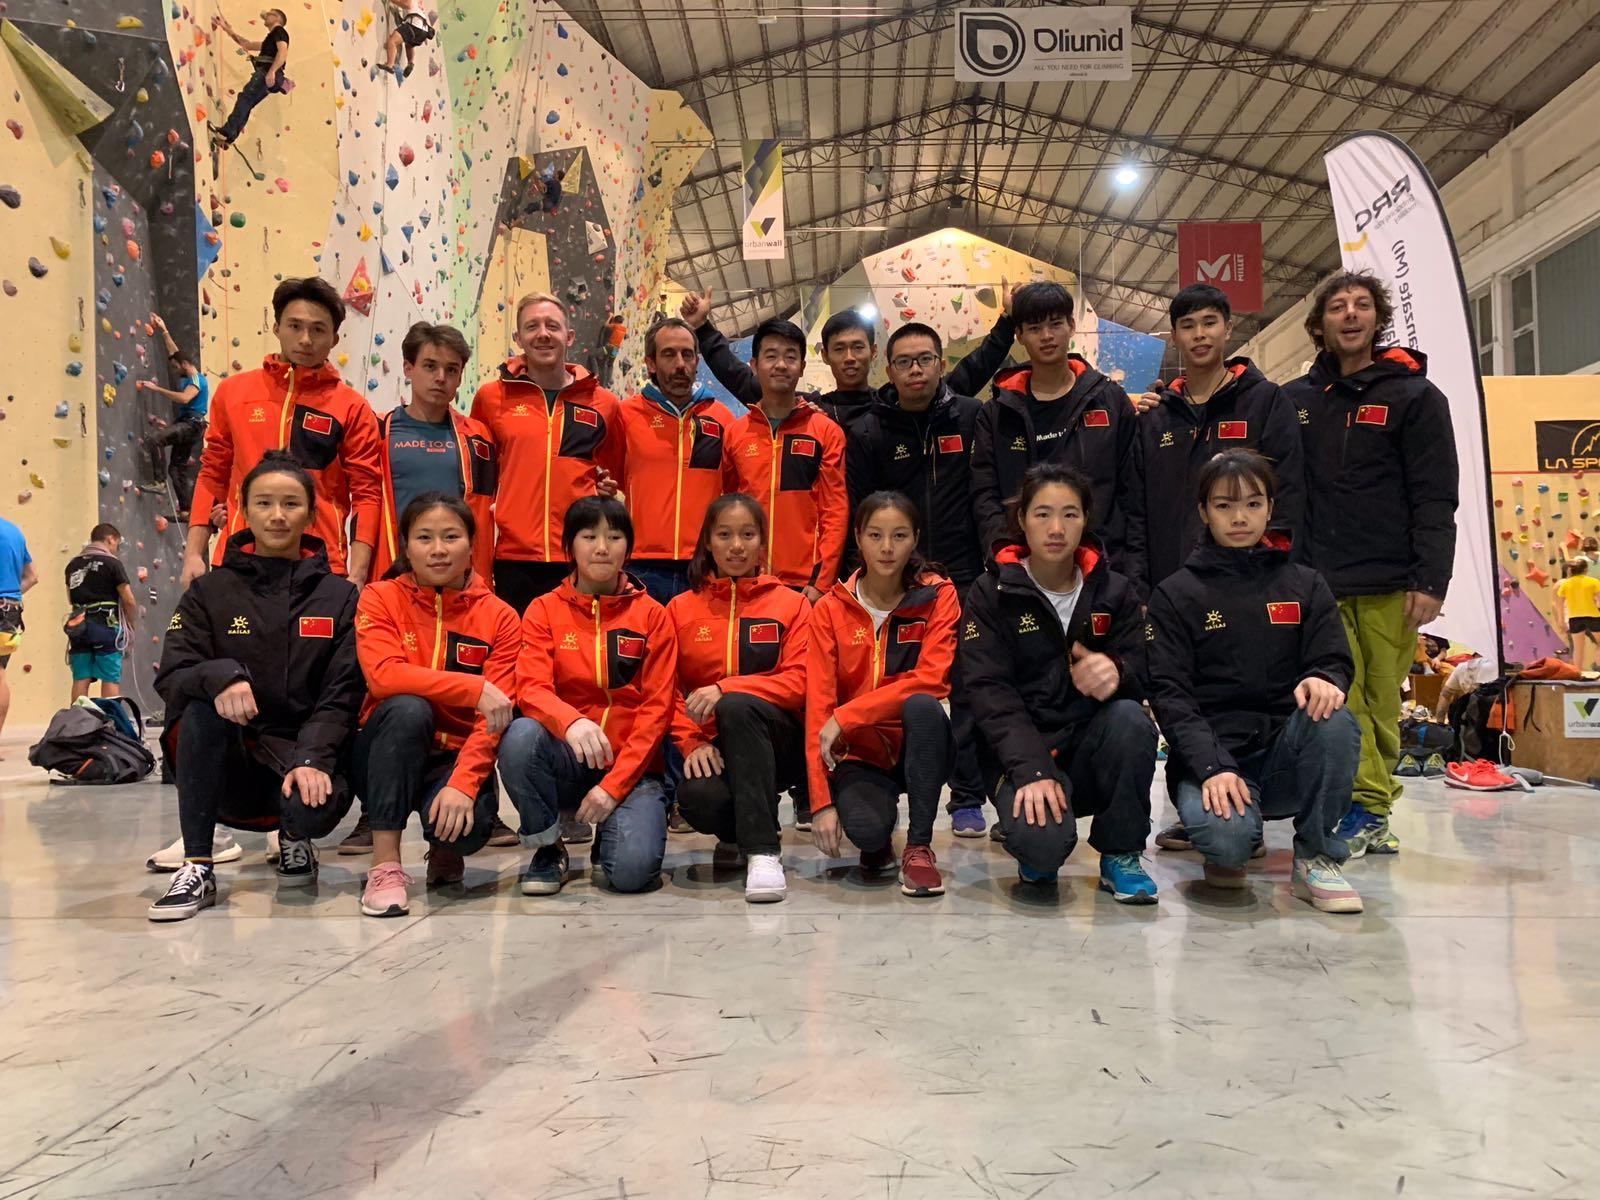 milano climbing expo 2019 Team Olimpico RPC